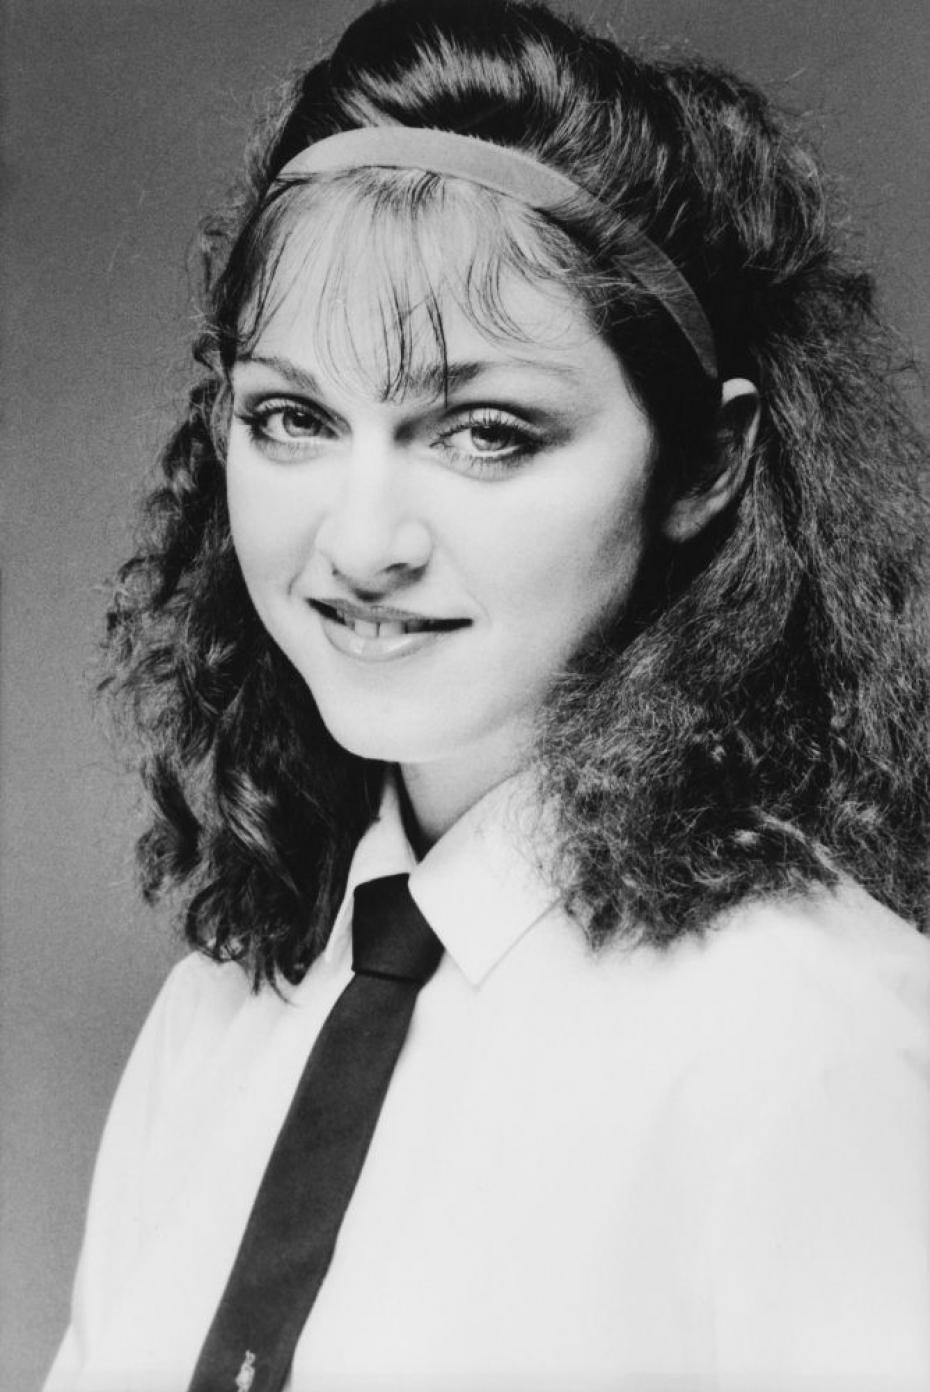 Madonna yearbook photo one at Reddit.com at Reddit.com